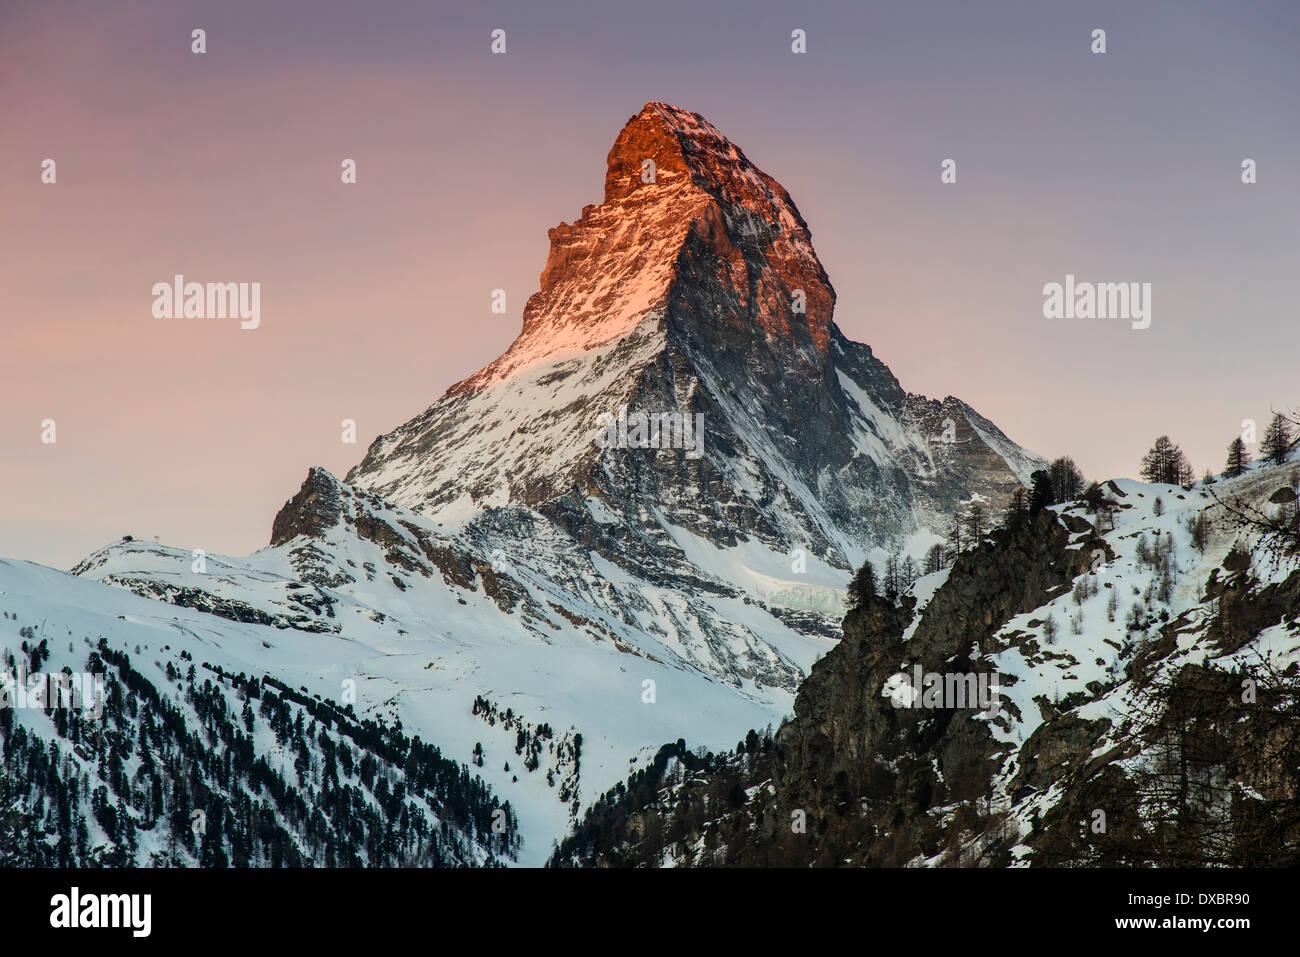 Vista invernal de Matterhorn al amanecer, Zermatt, Vales o Valais, Suiza Foto de stock